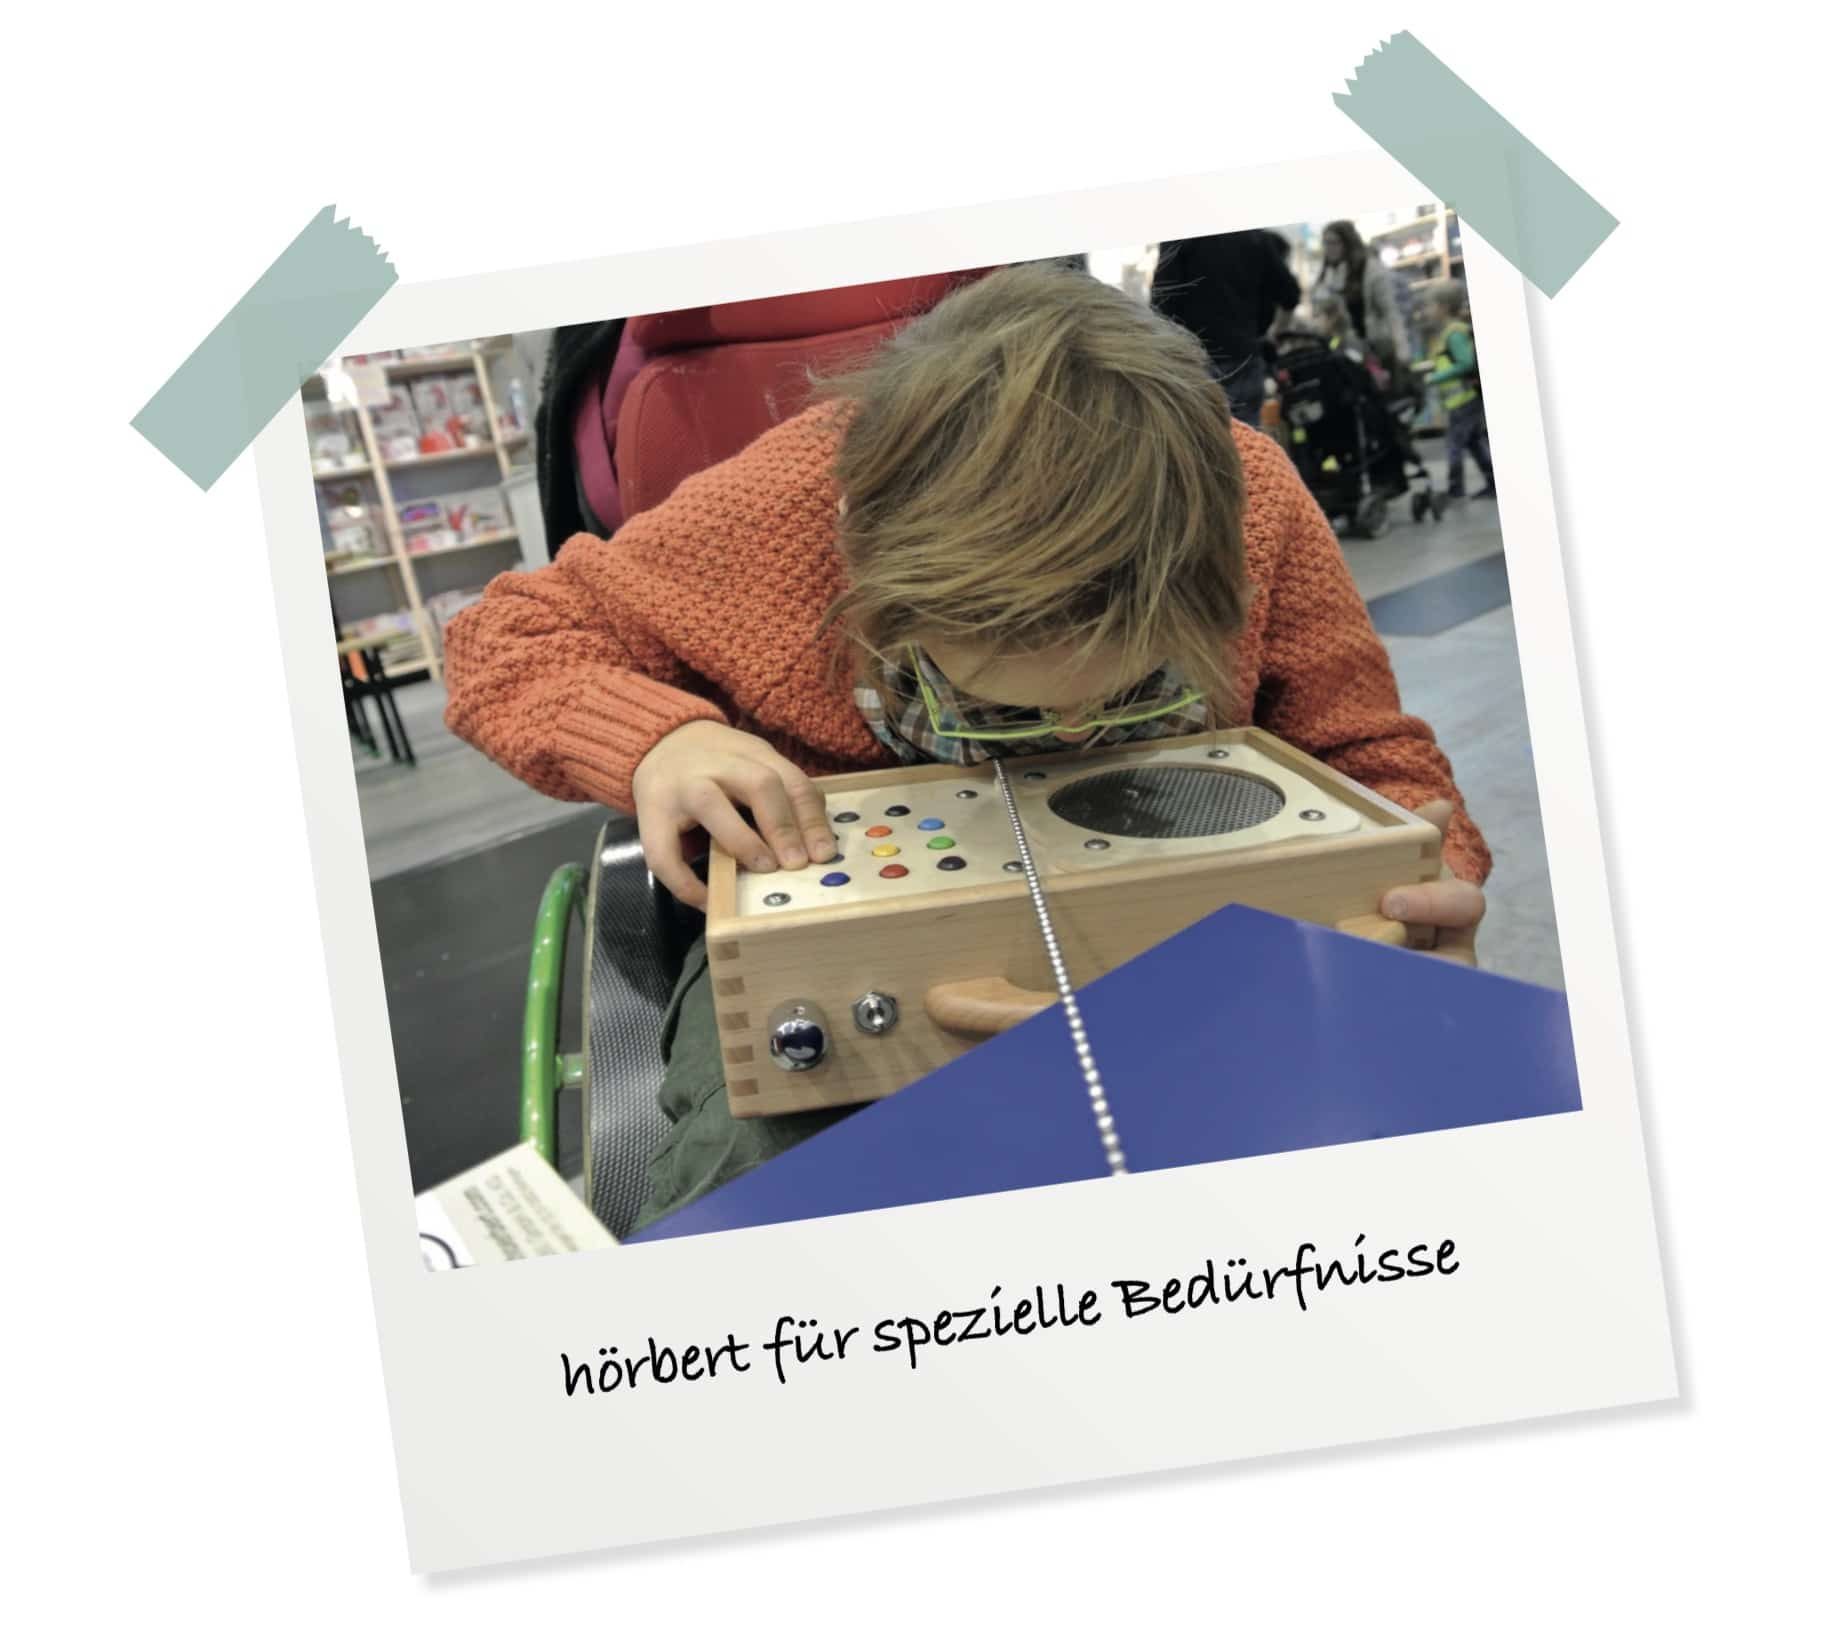 Behindertes Kind mit hörbert